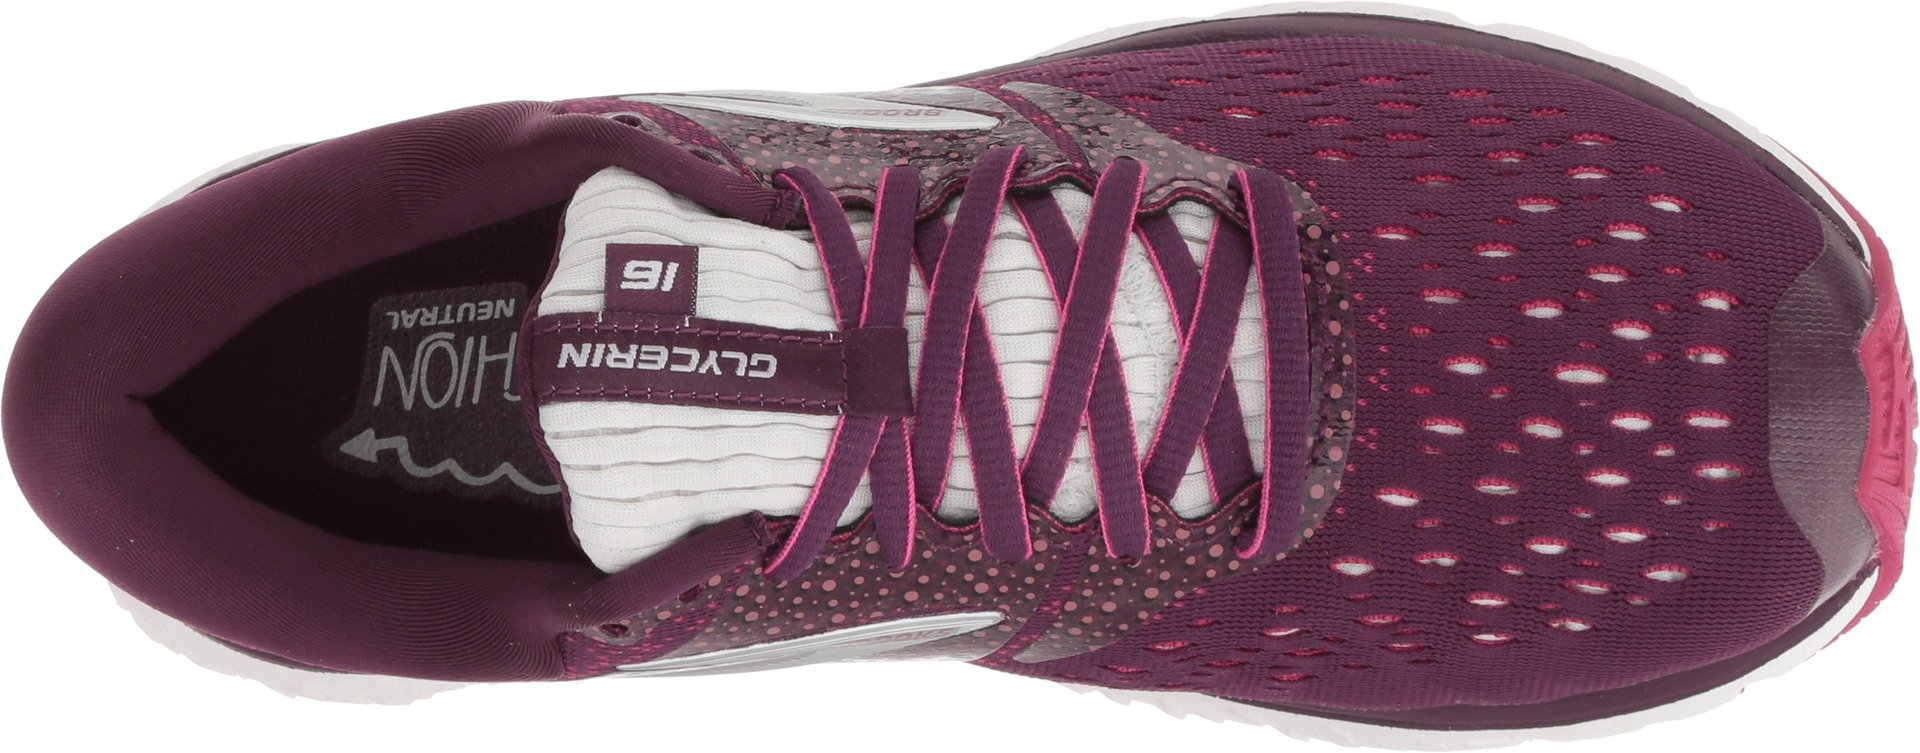 Brooks Women's Glycerin 16 Purple/Pink/Grey 6.5 B US by Brooks (Image #2)